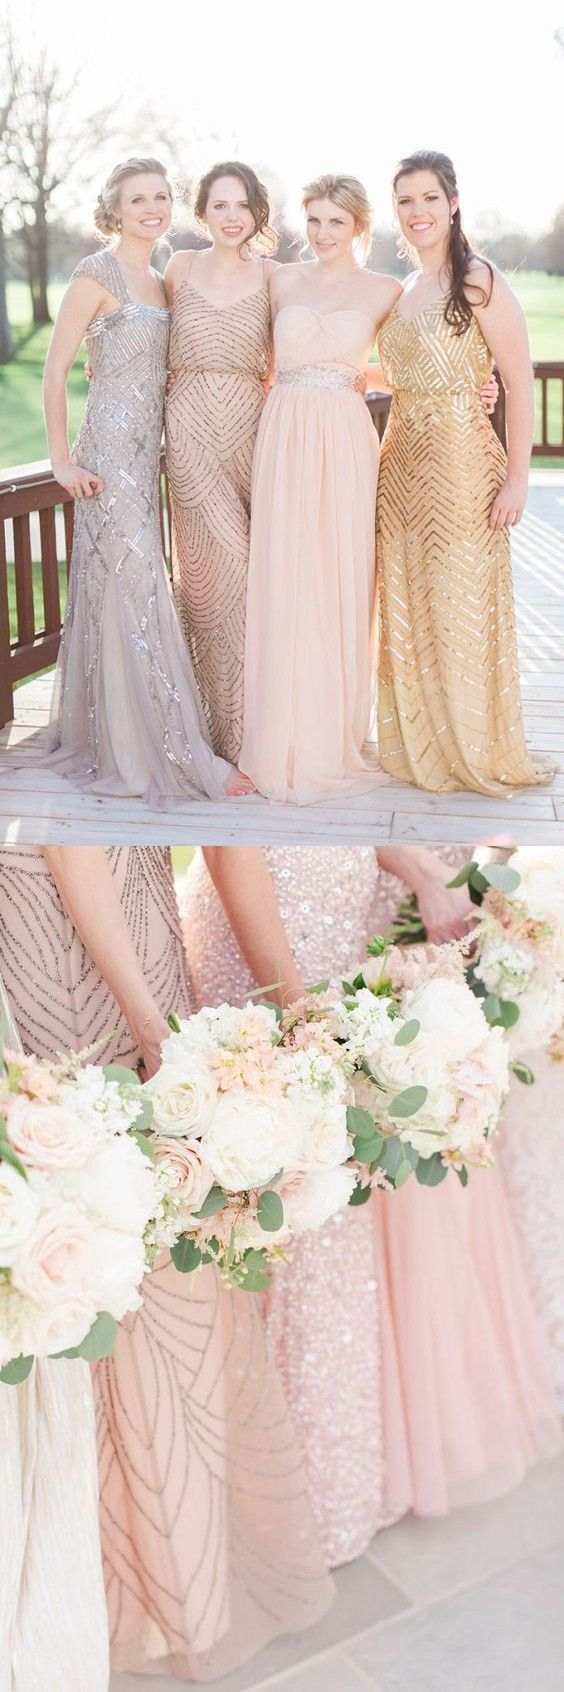 Sparkle V-neck Floor Length Champagne Bridesmaid Dress